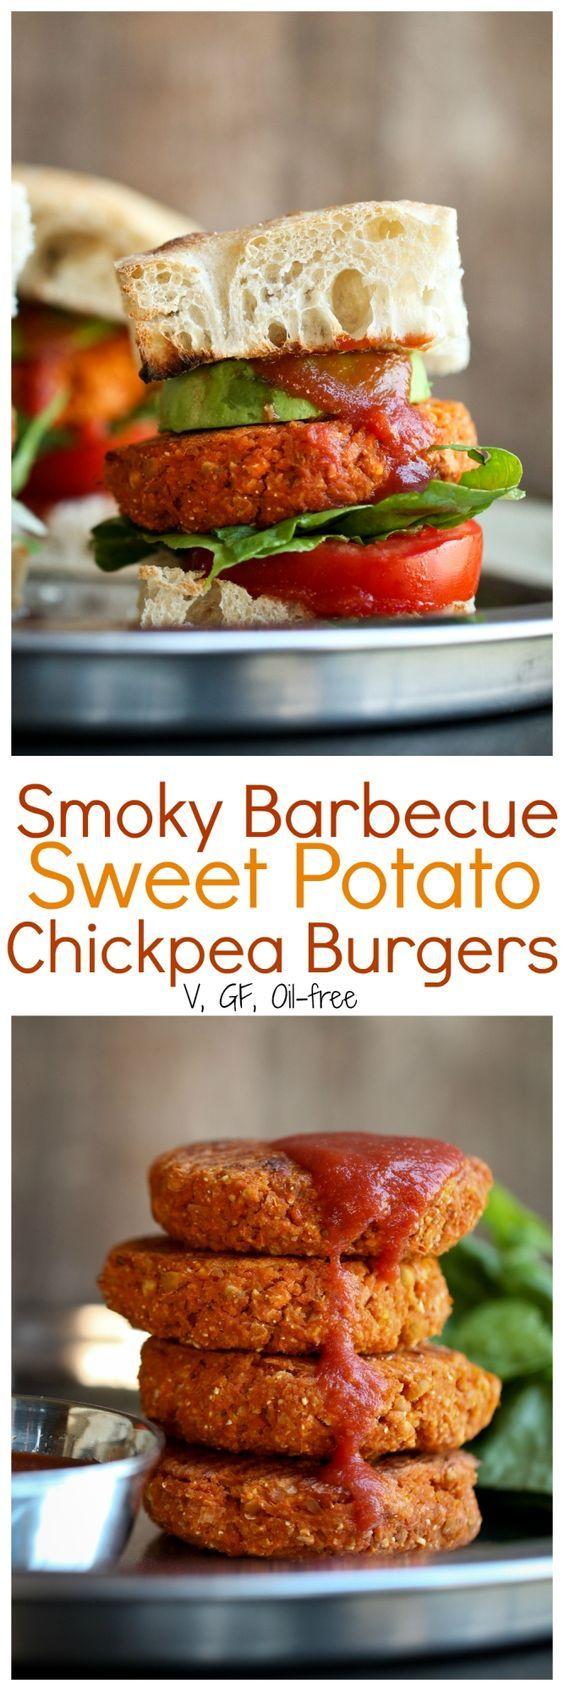 Smoky Barbecue Sweet Potato Chickpea Burgers